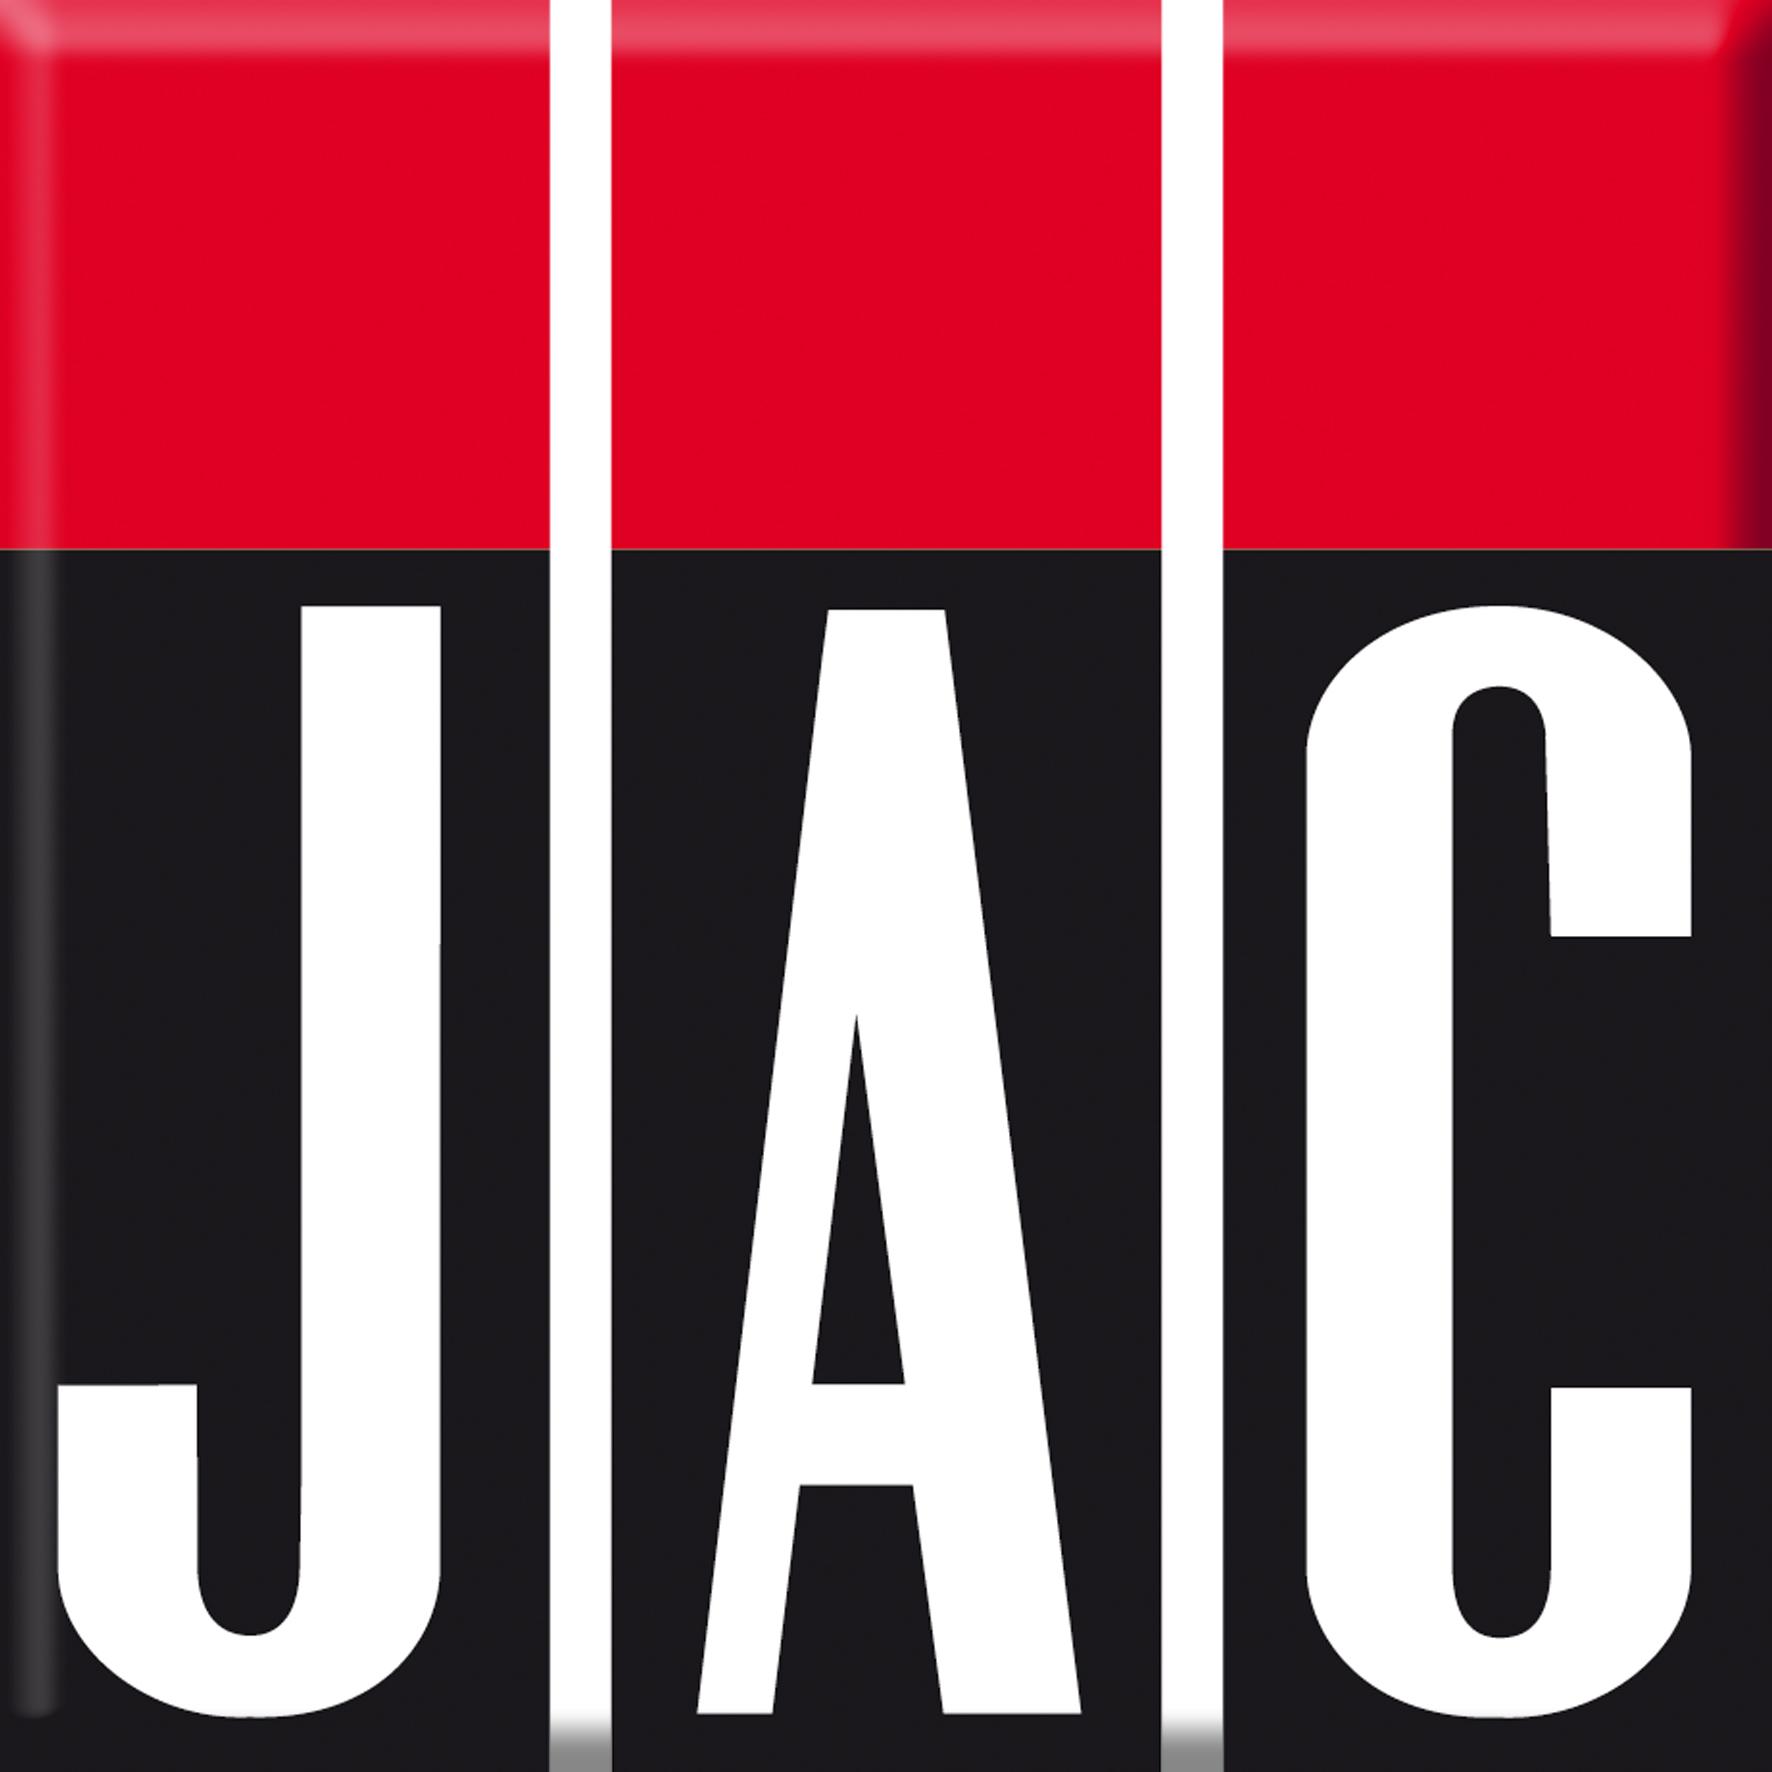 logo JAC rgb 3D.jpg